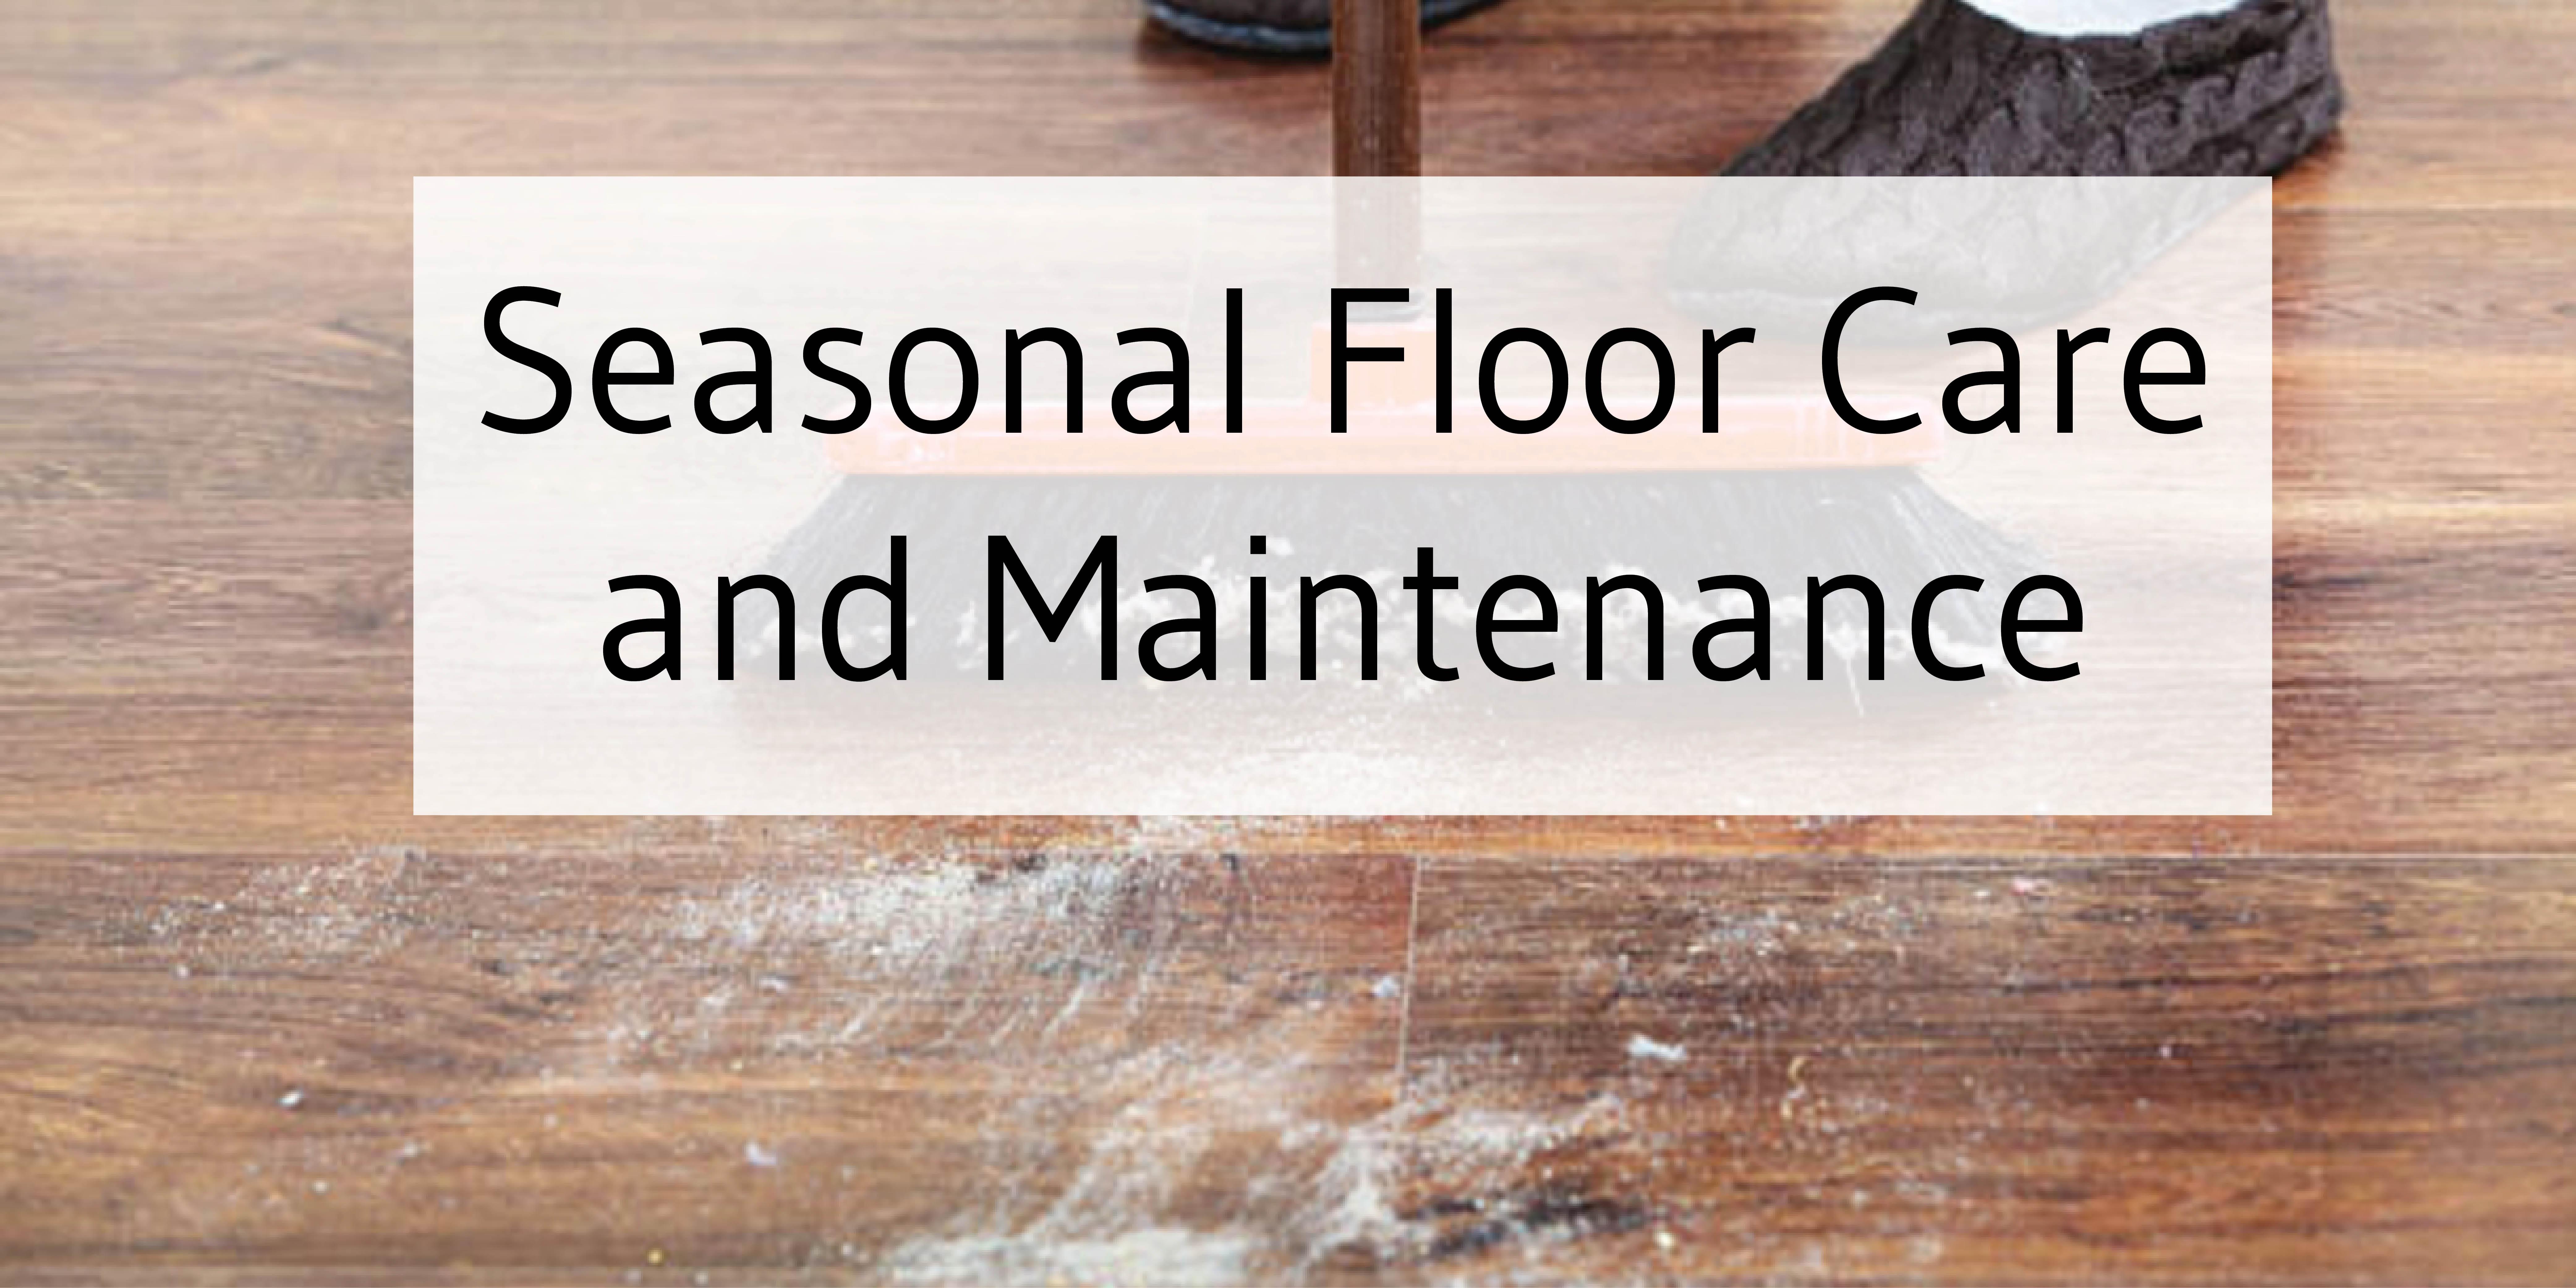 Seasonal Floor Care And Maintenance